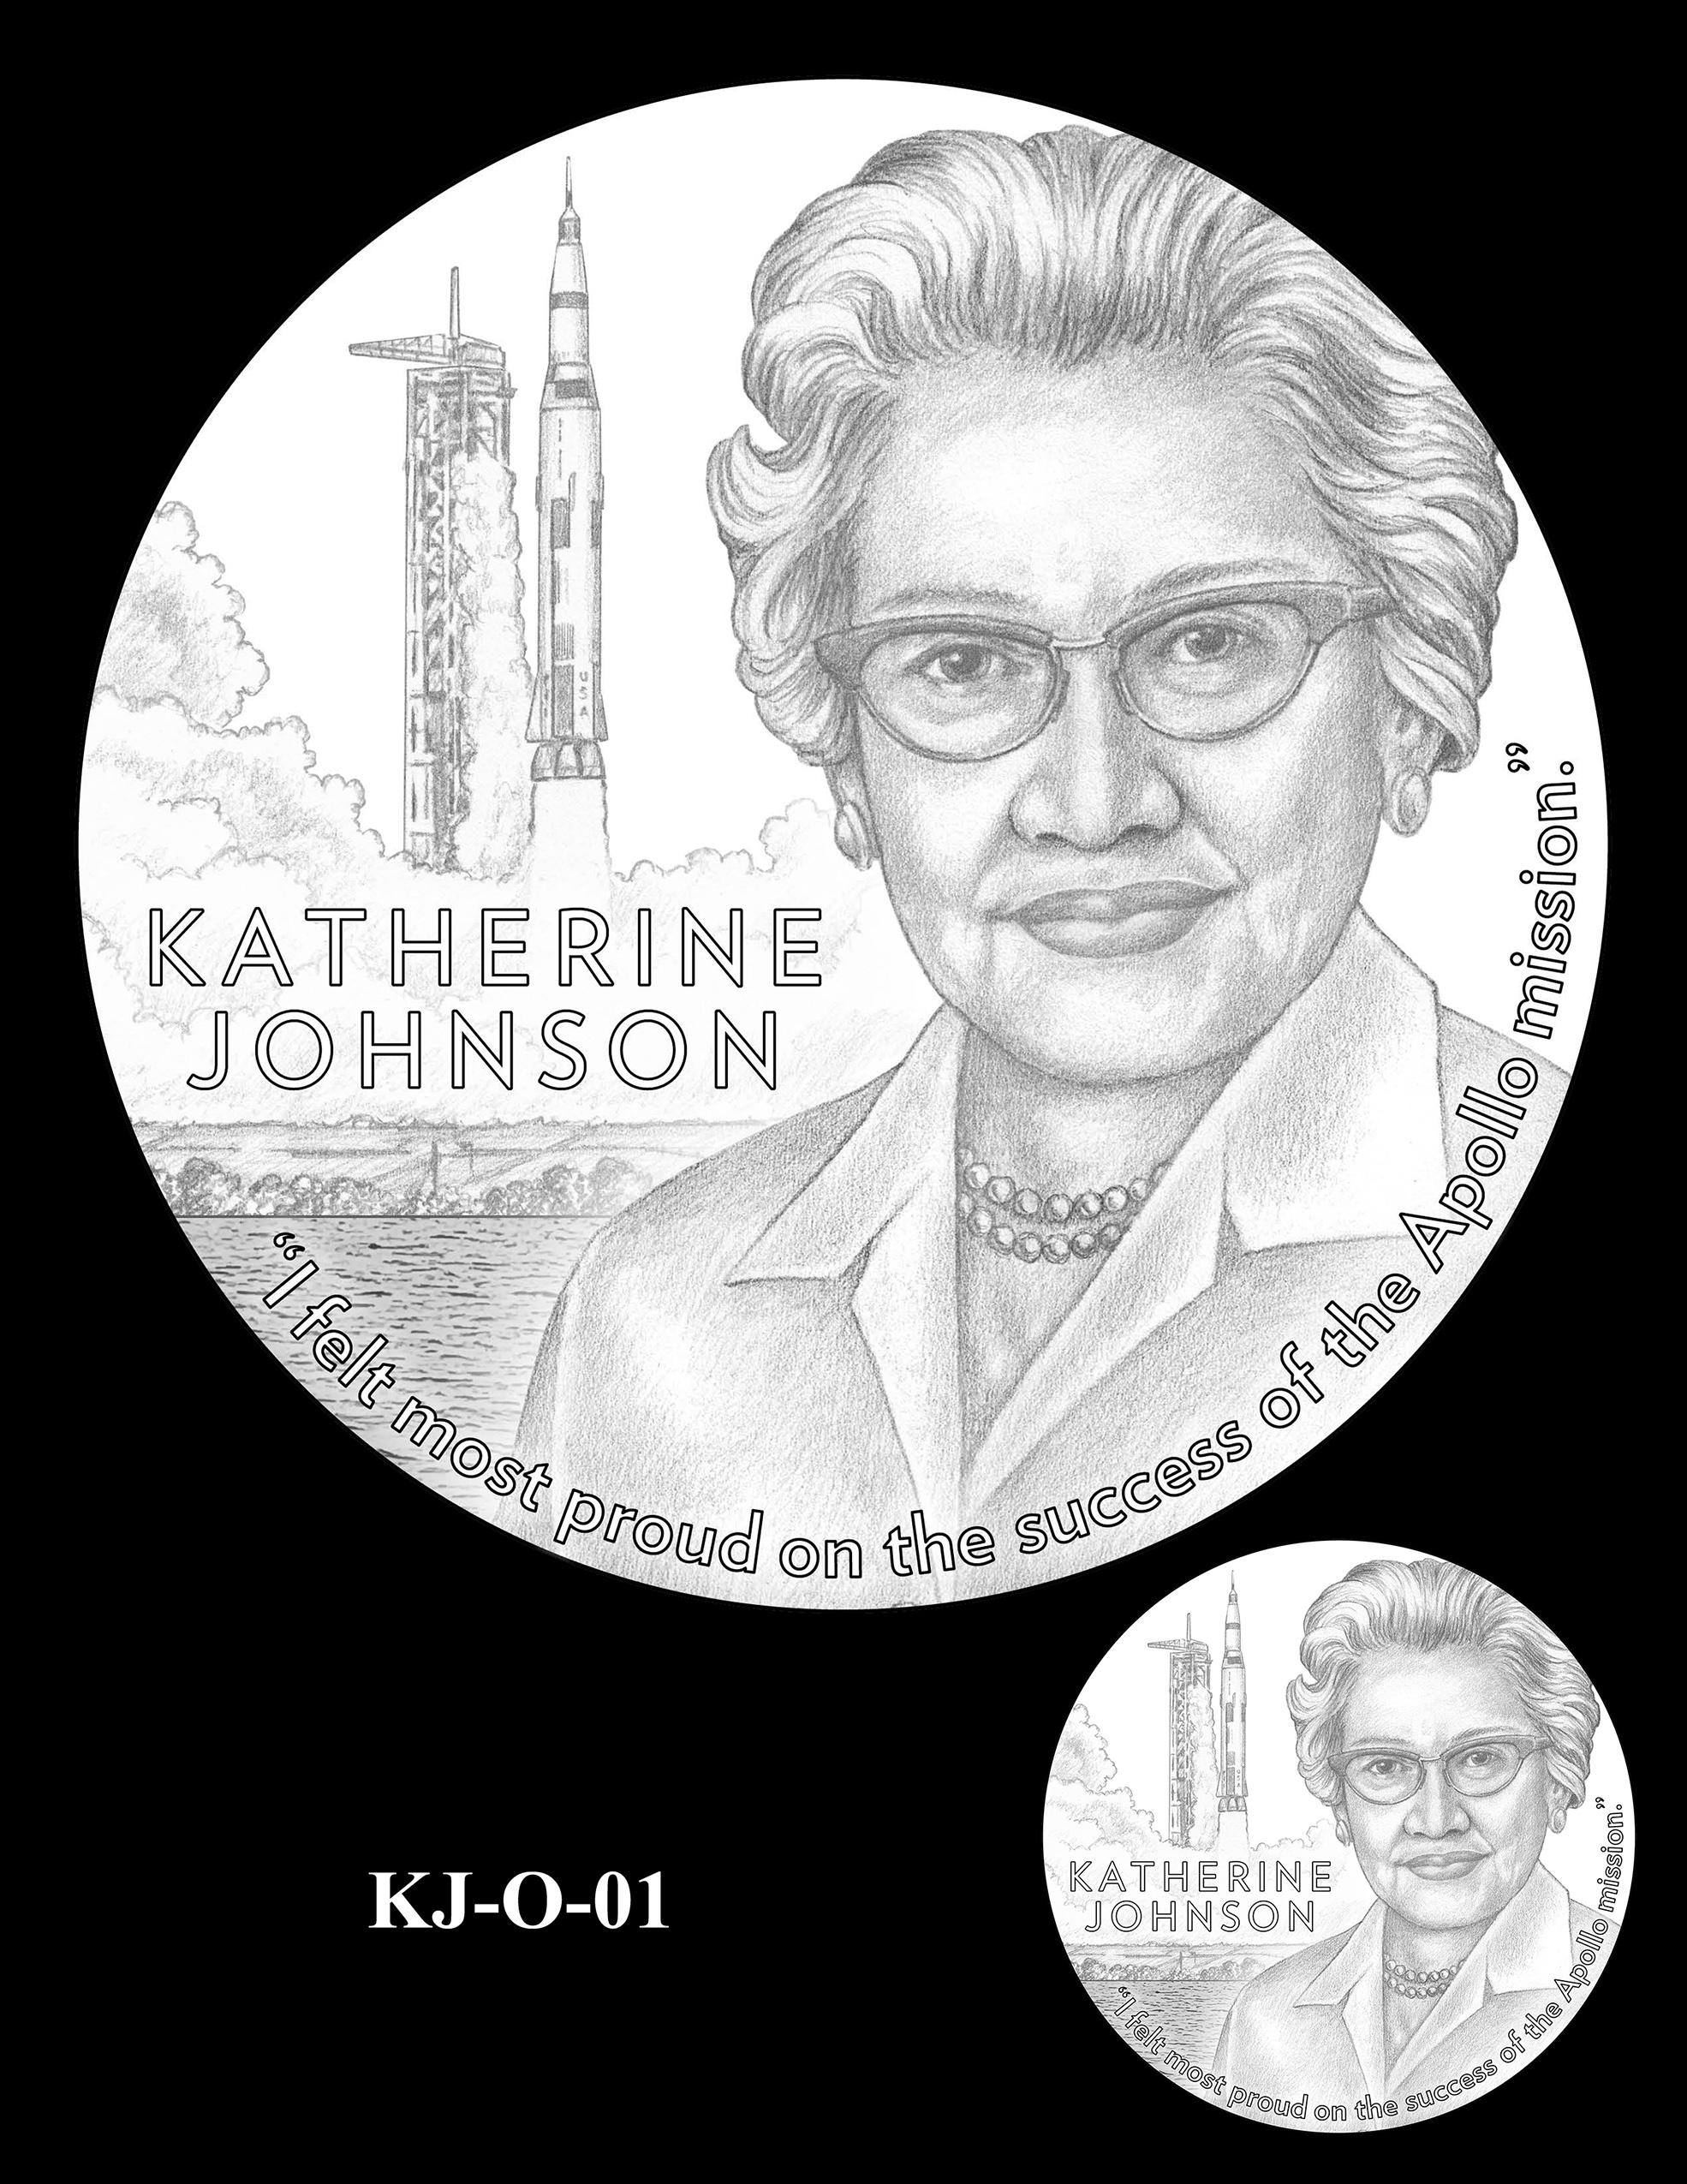 KJ-O-01 -- Katherine Johnson Congressional Gold Medal